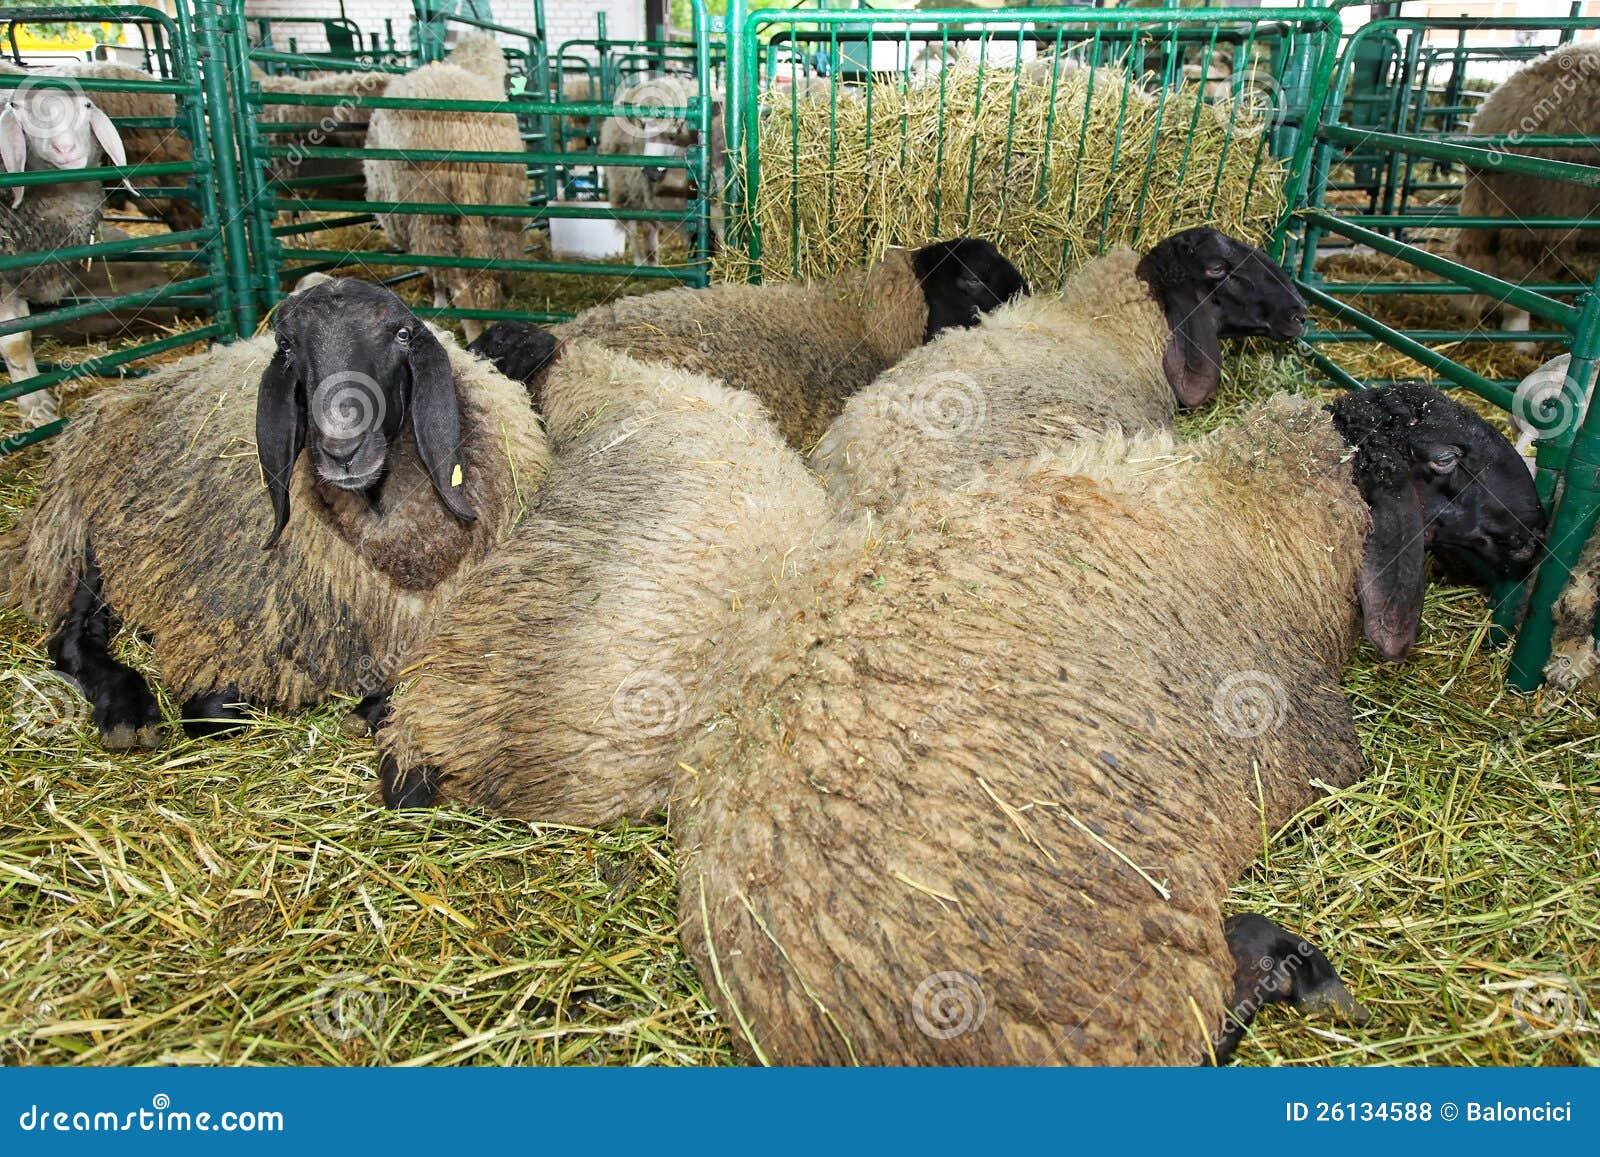 Sheep Pen Royalty Free Stock Photos - Image: 26134588